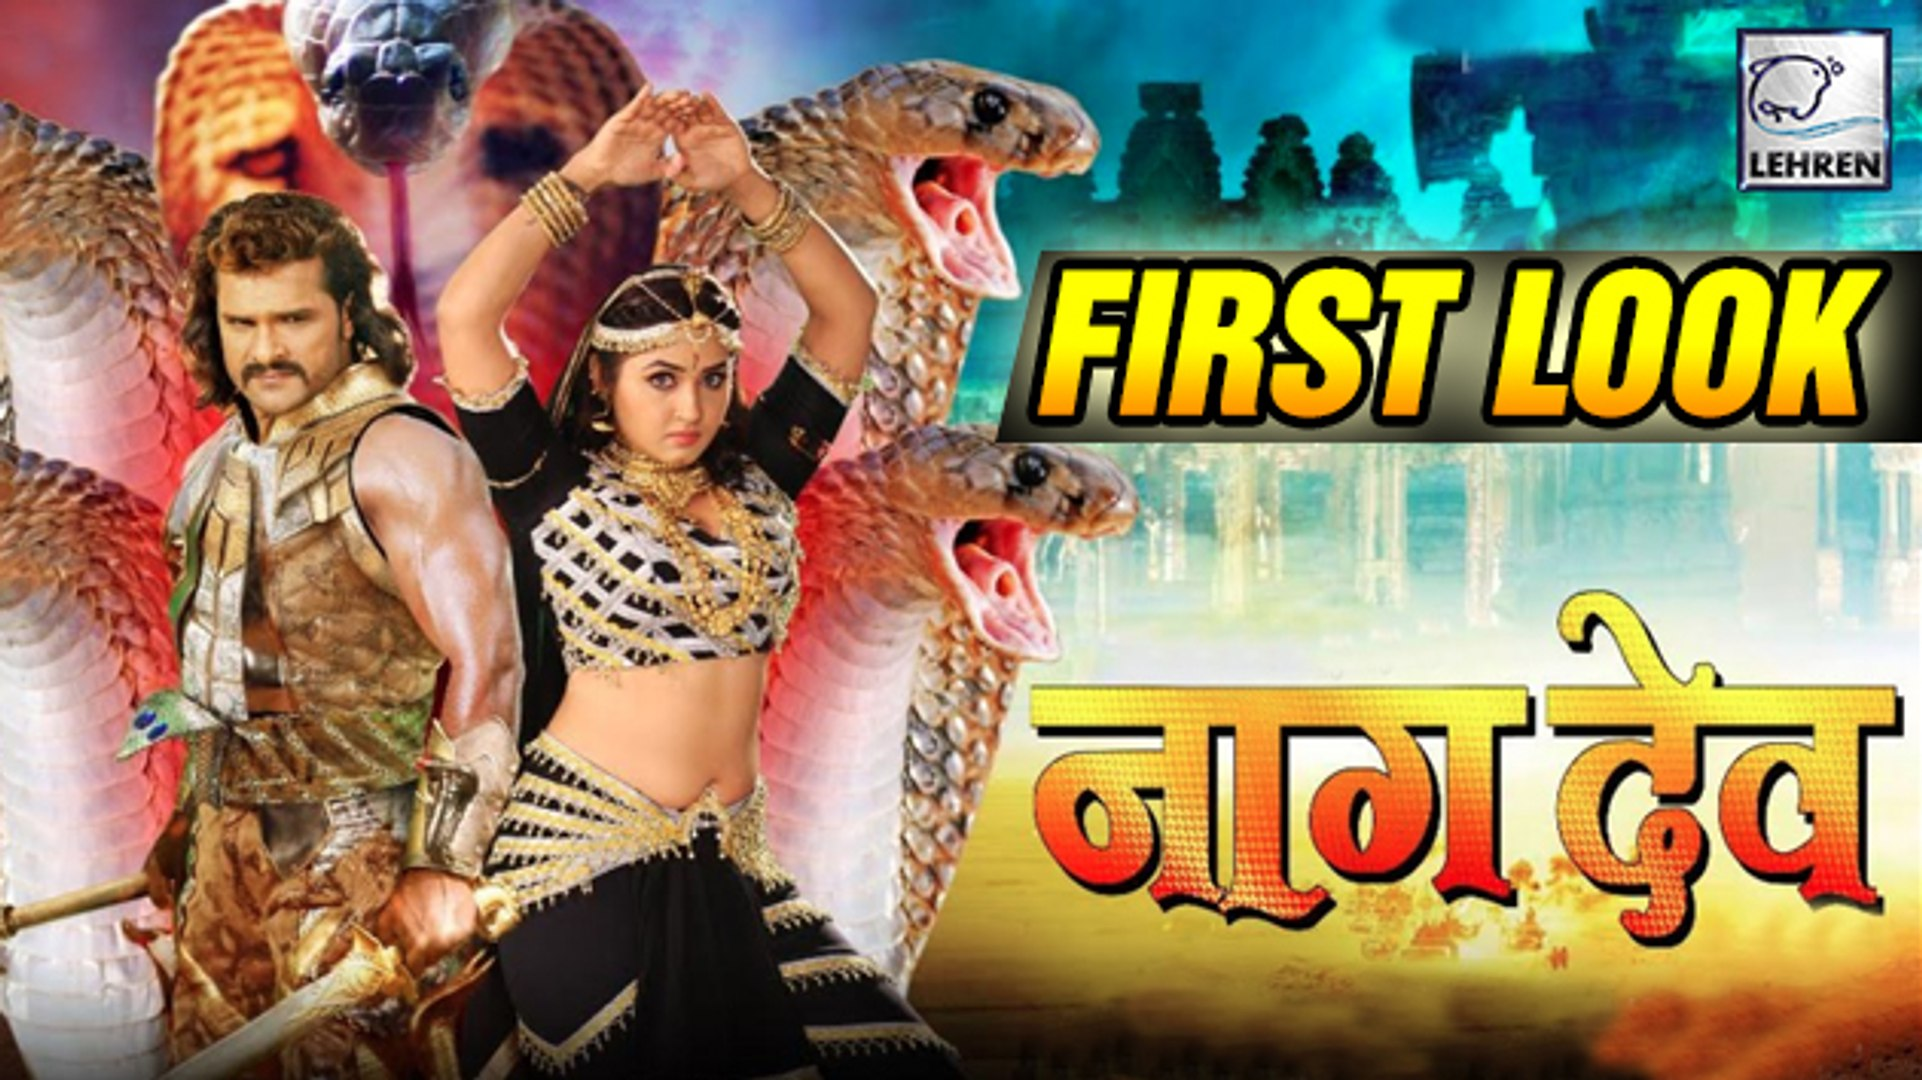 न ग न ग न बन ख स र क जल क फ ल म न गद व क फर स ट ल क आउट Nagdev Bhojpuri